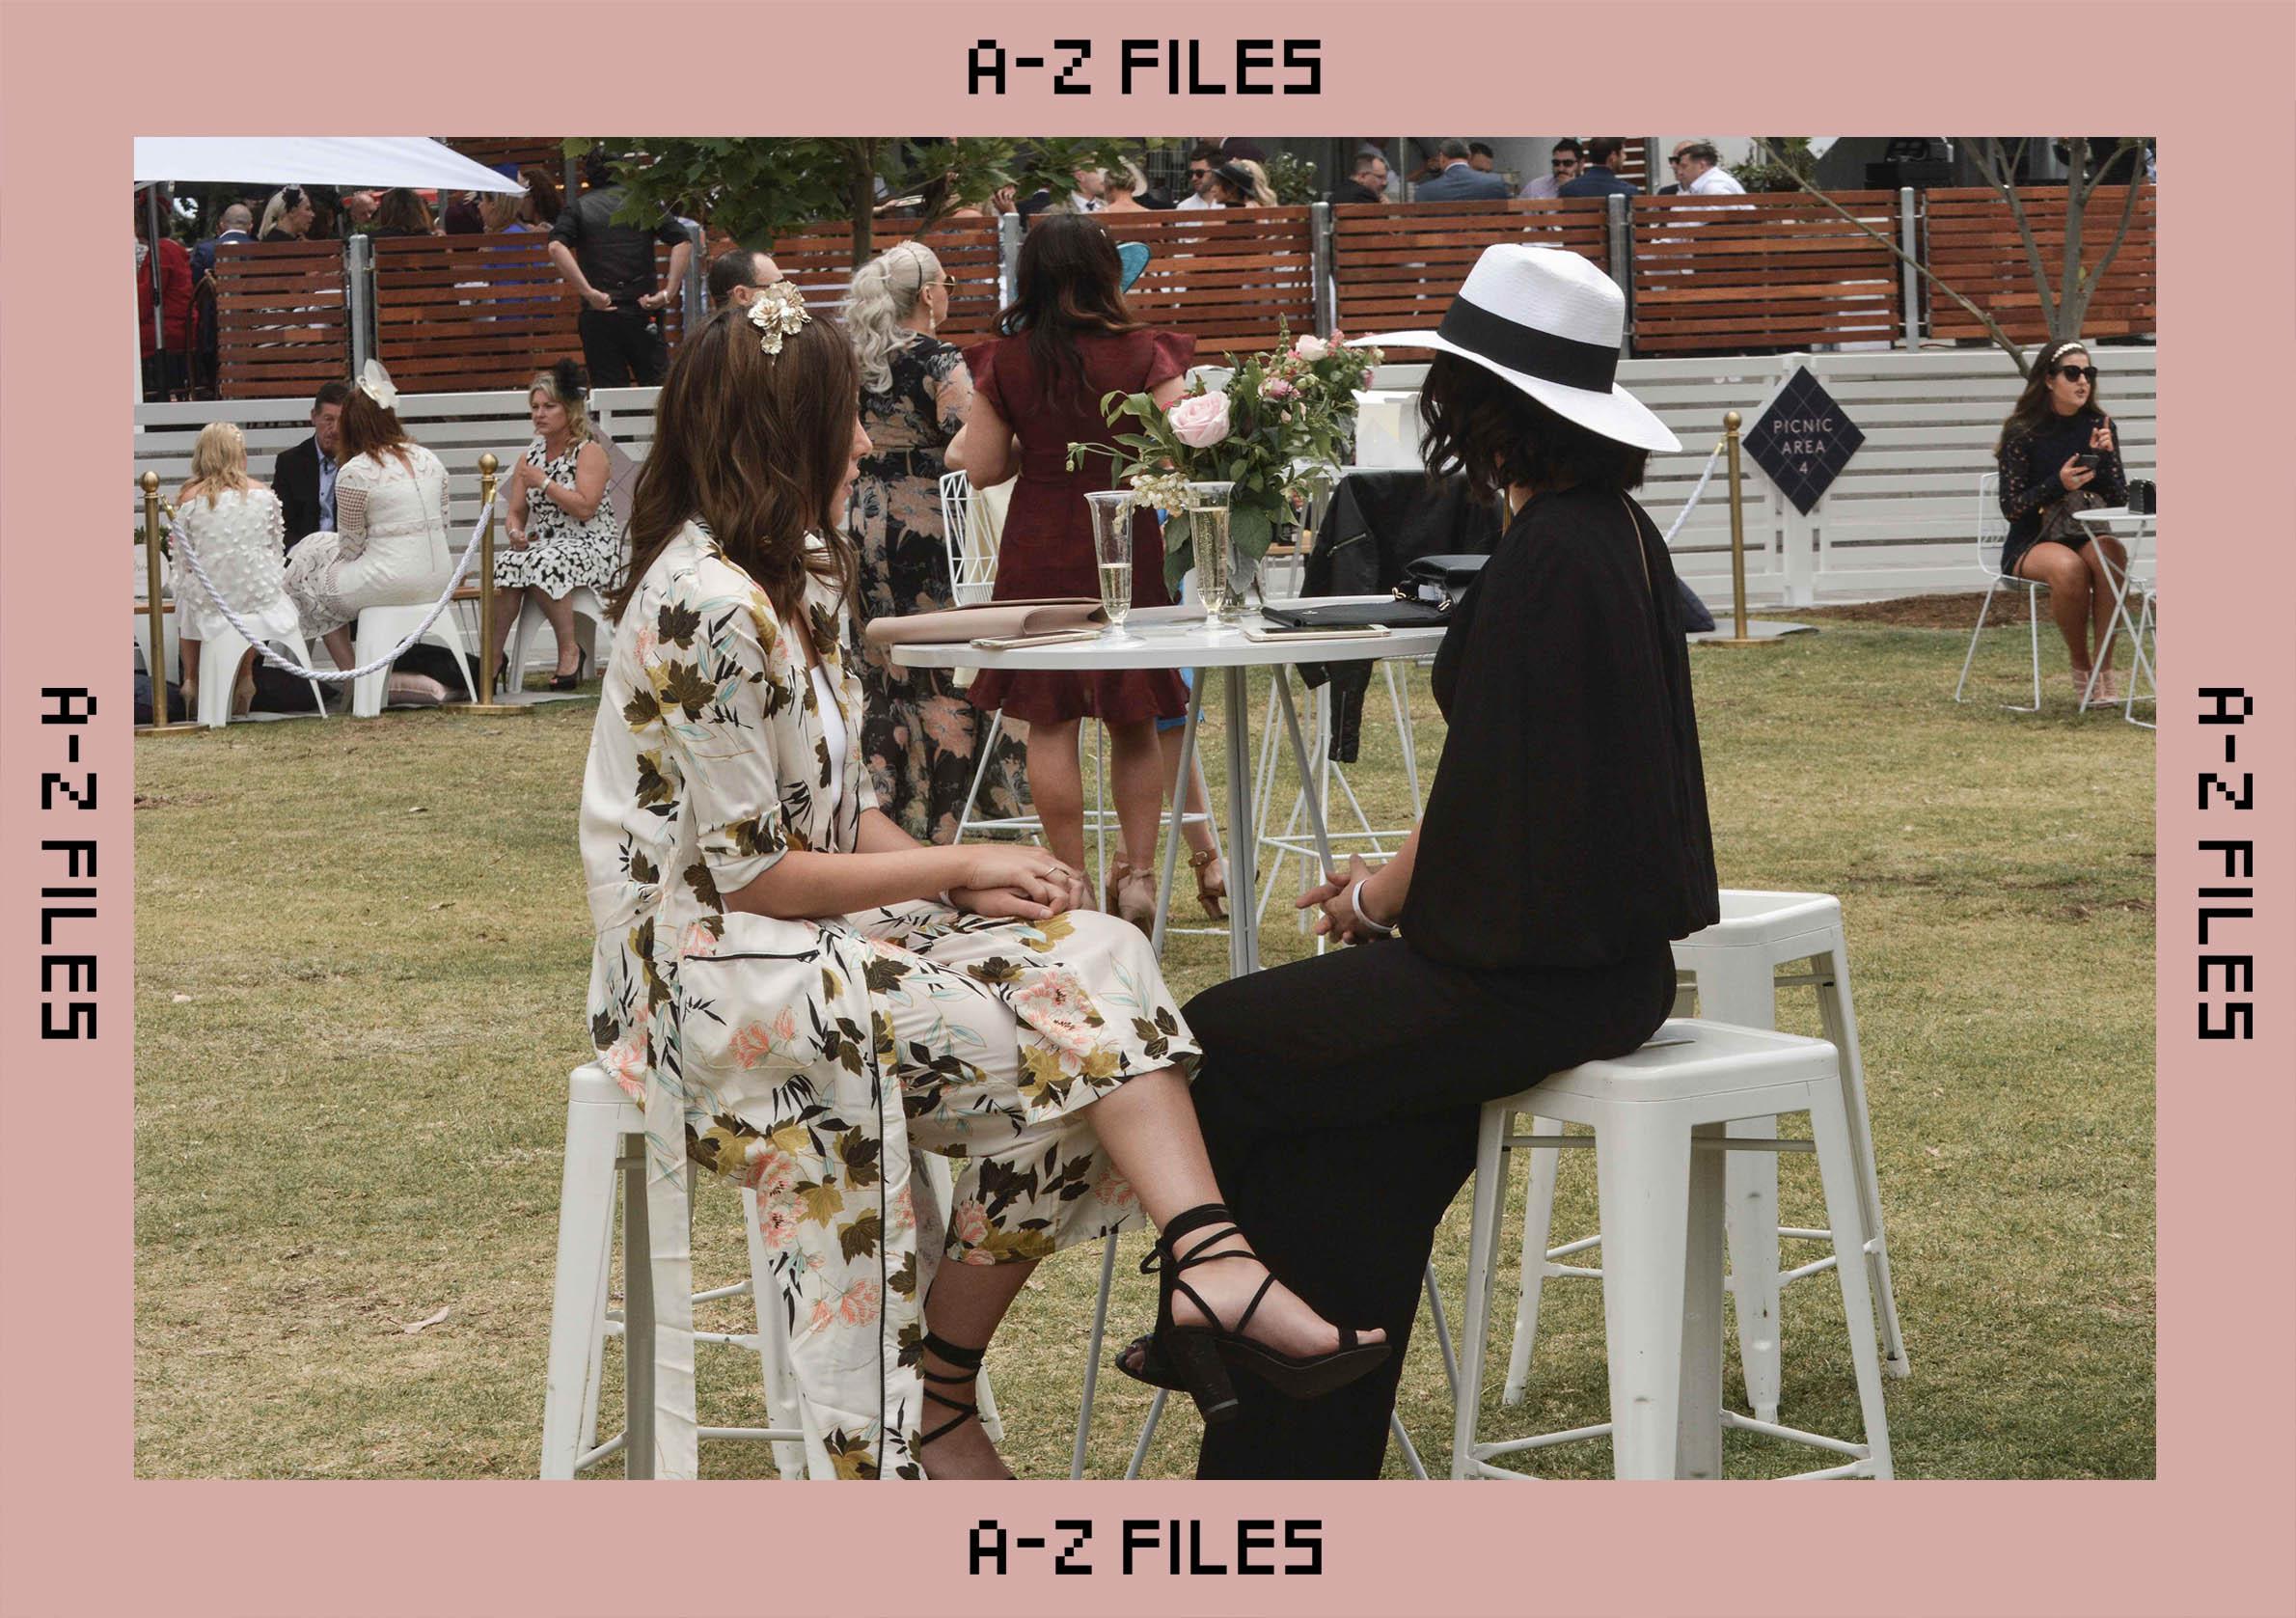 AZ FILES 3.jpg